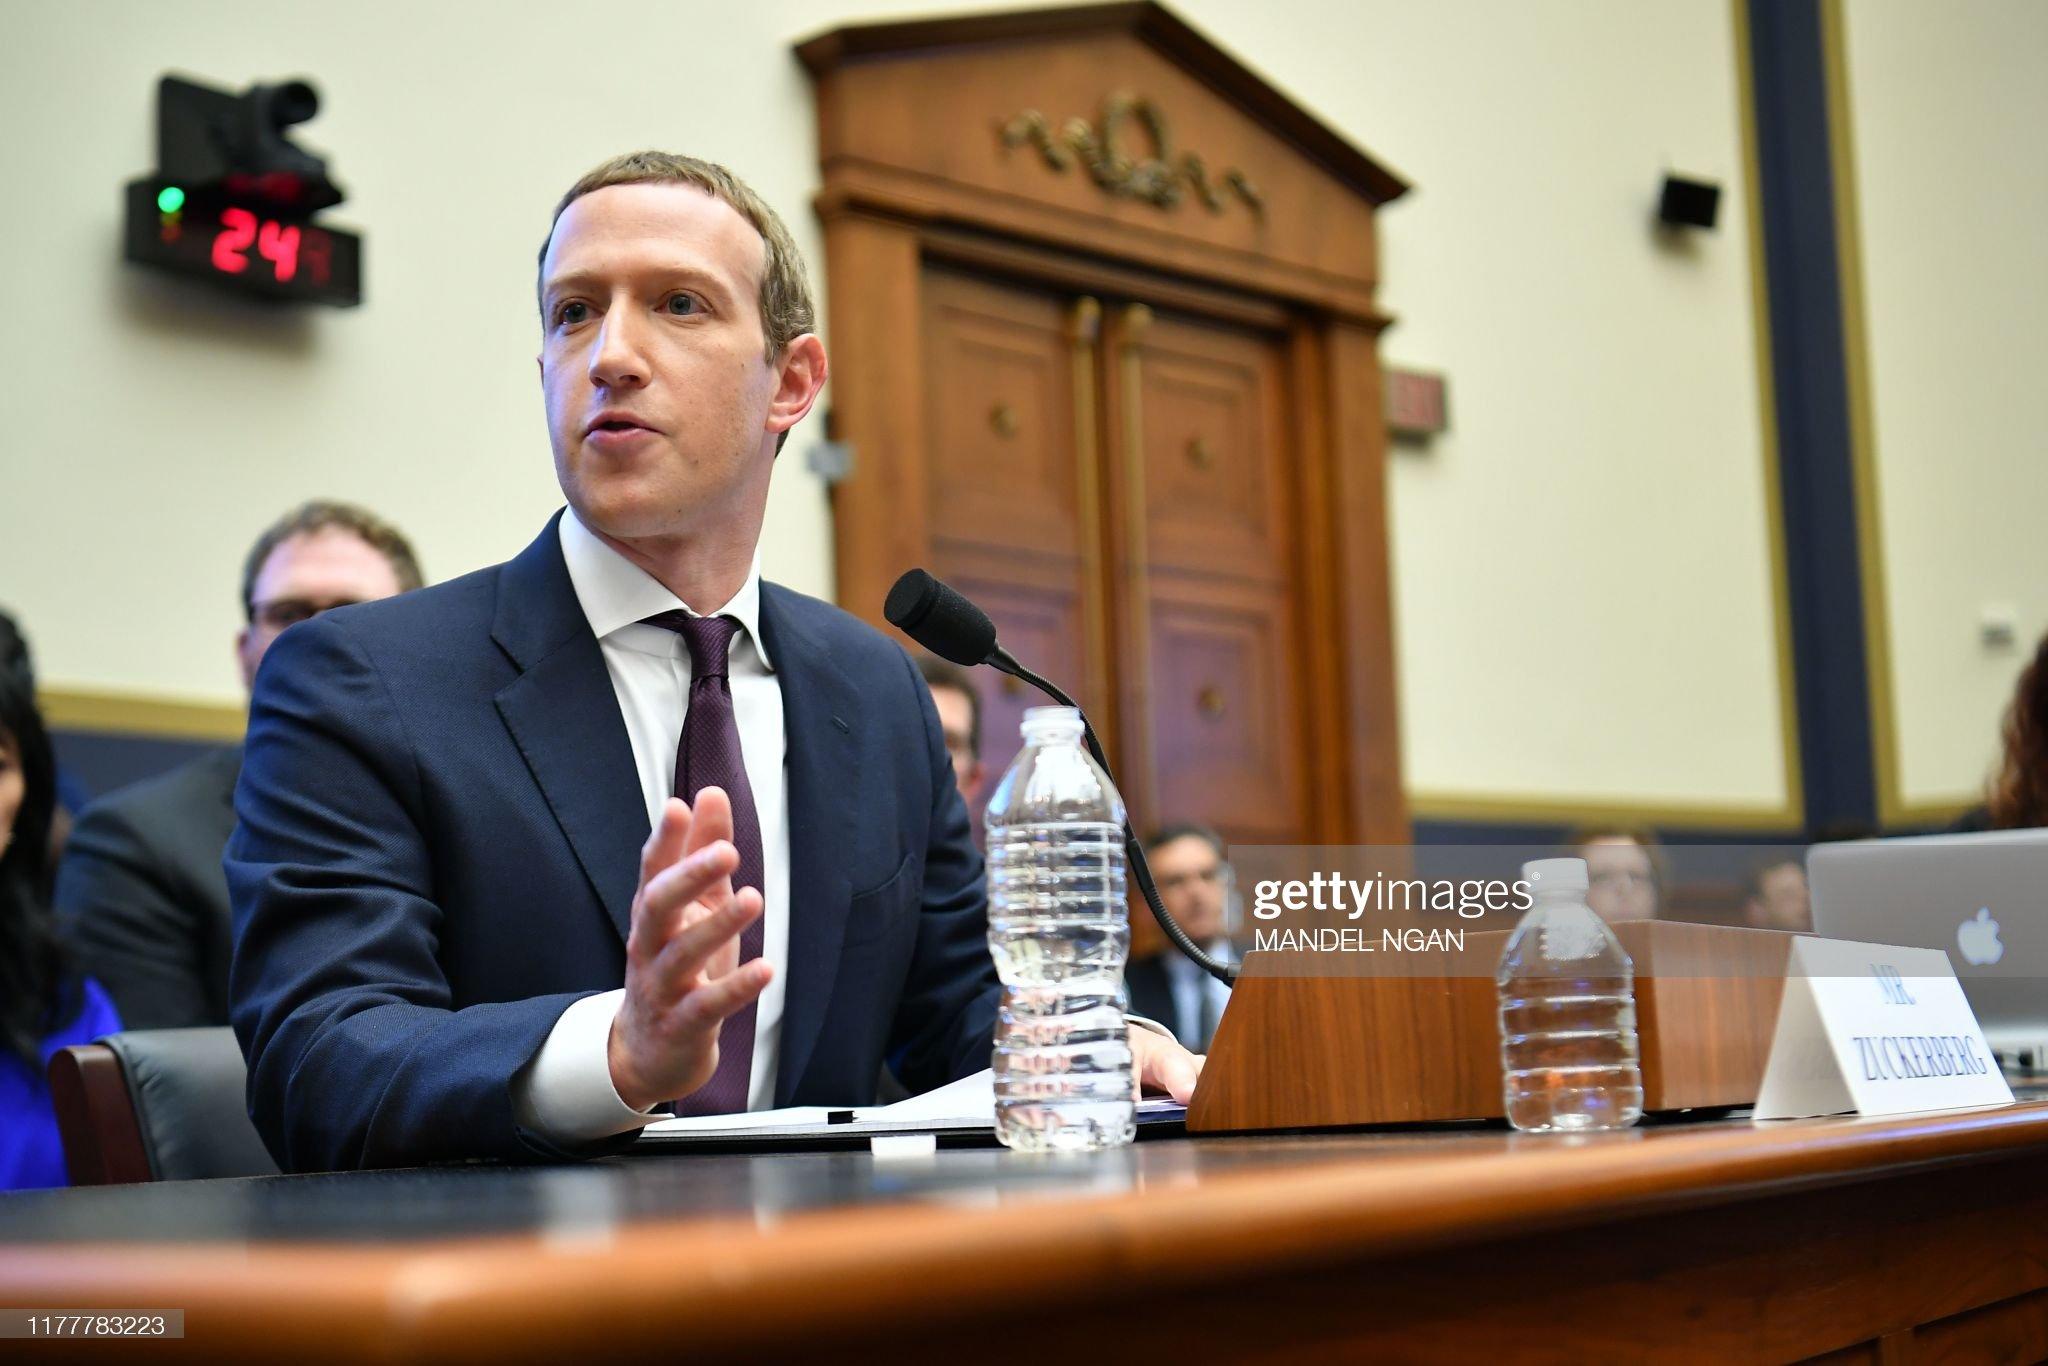 US-POLITICS-FACEBOOK-ZUCKERBERG : News Photo